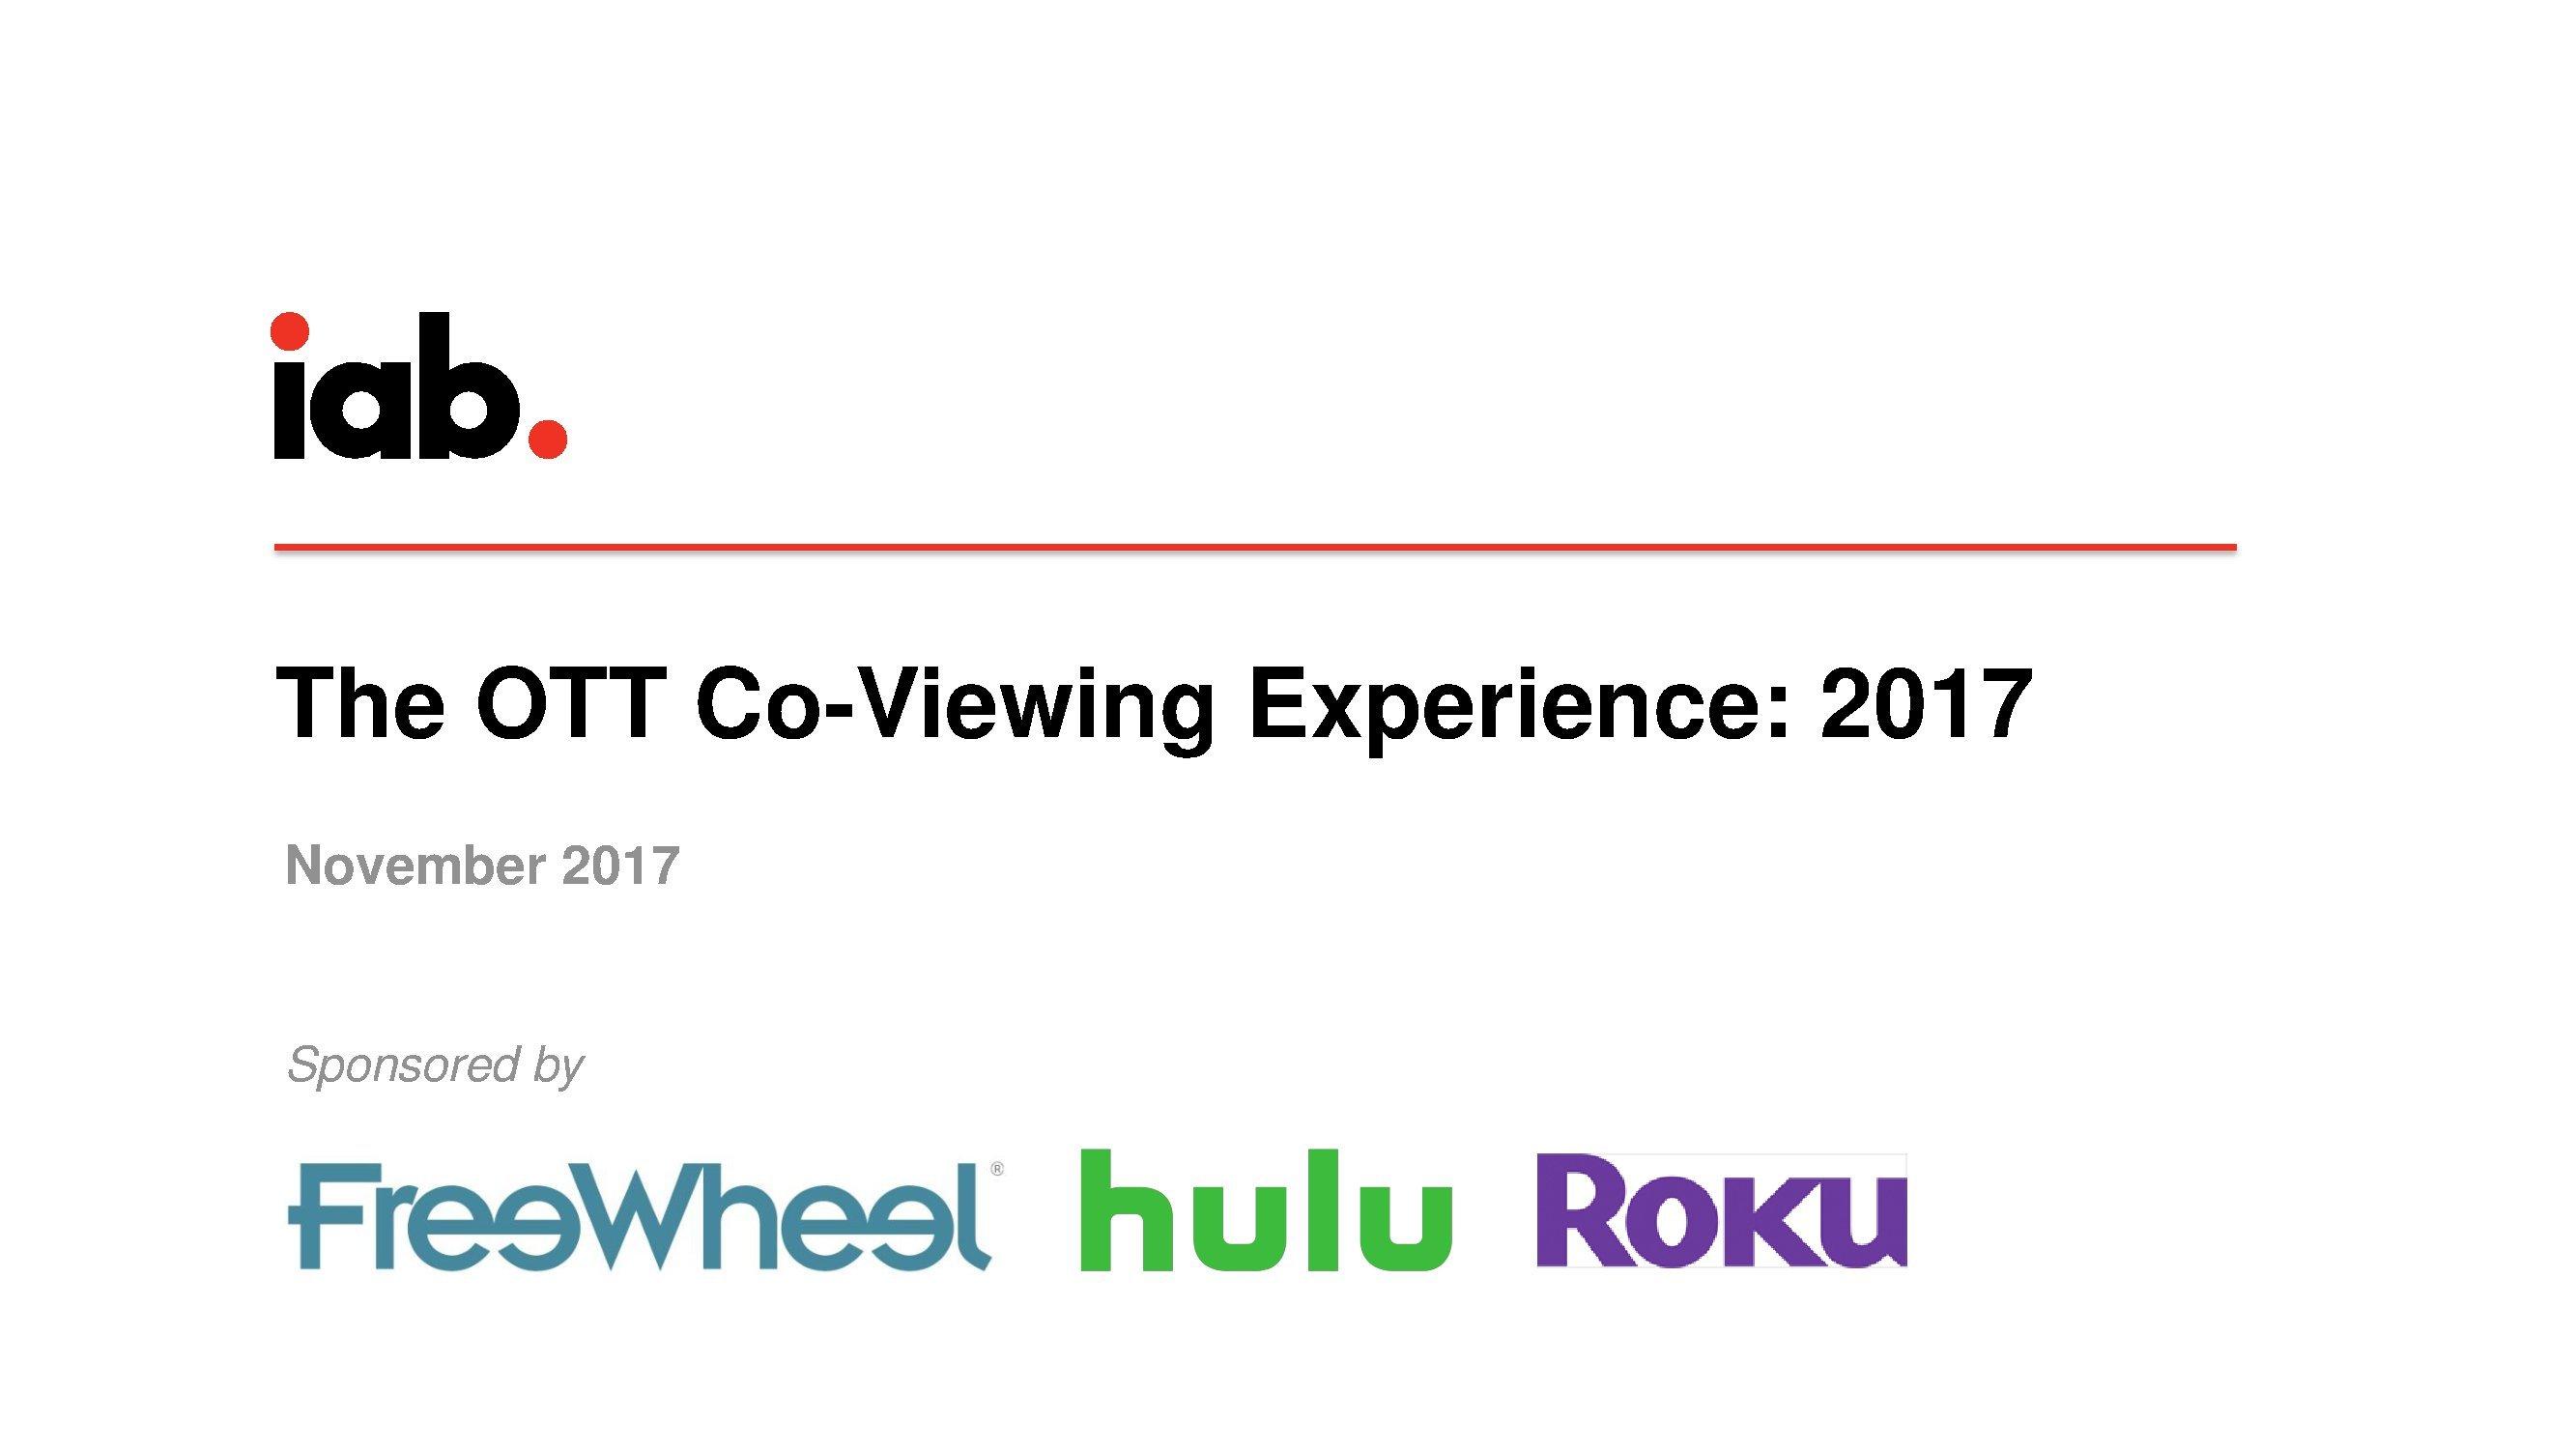 IAB:2017年OTT共同收视体验报告